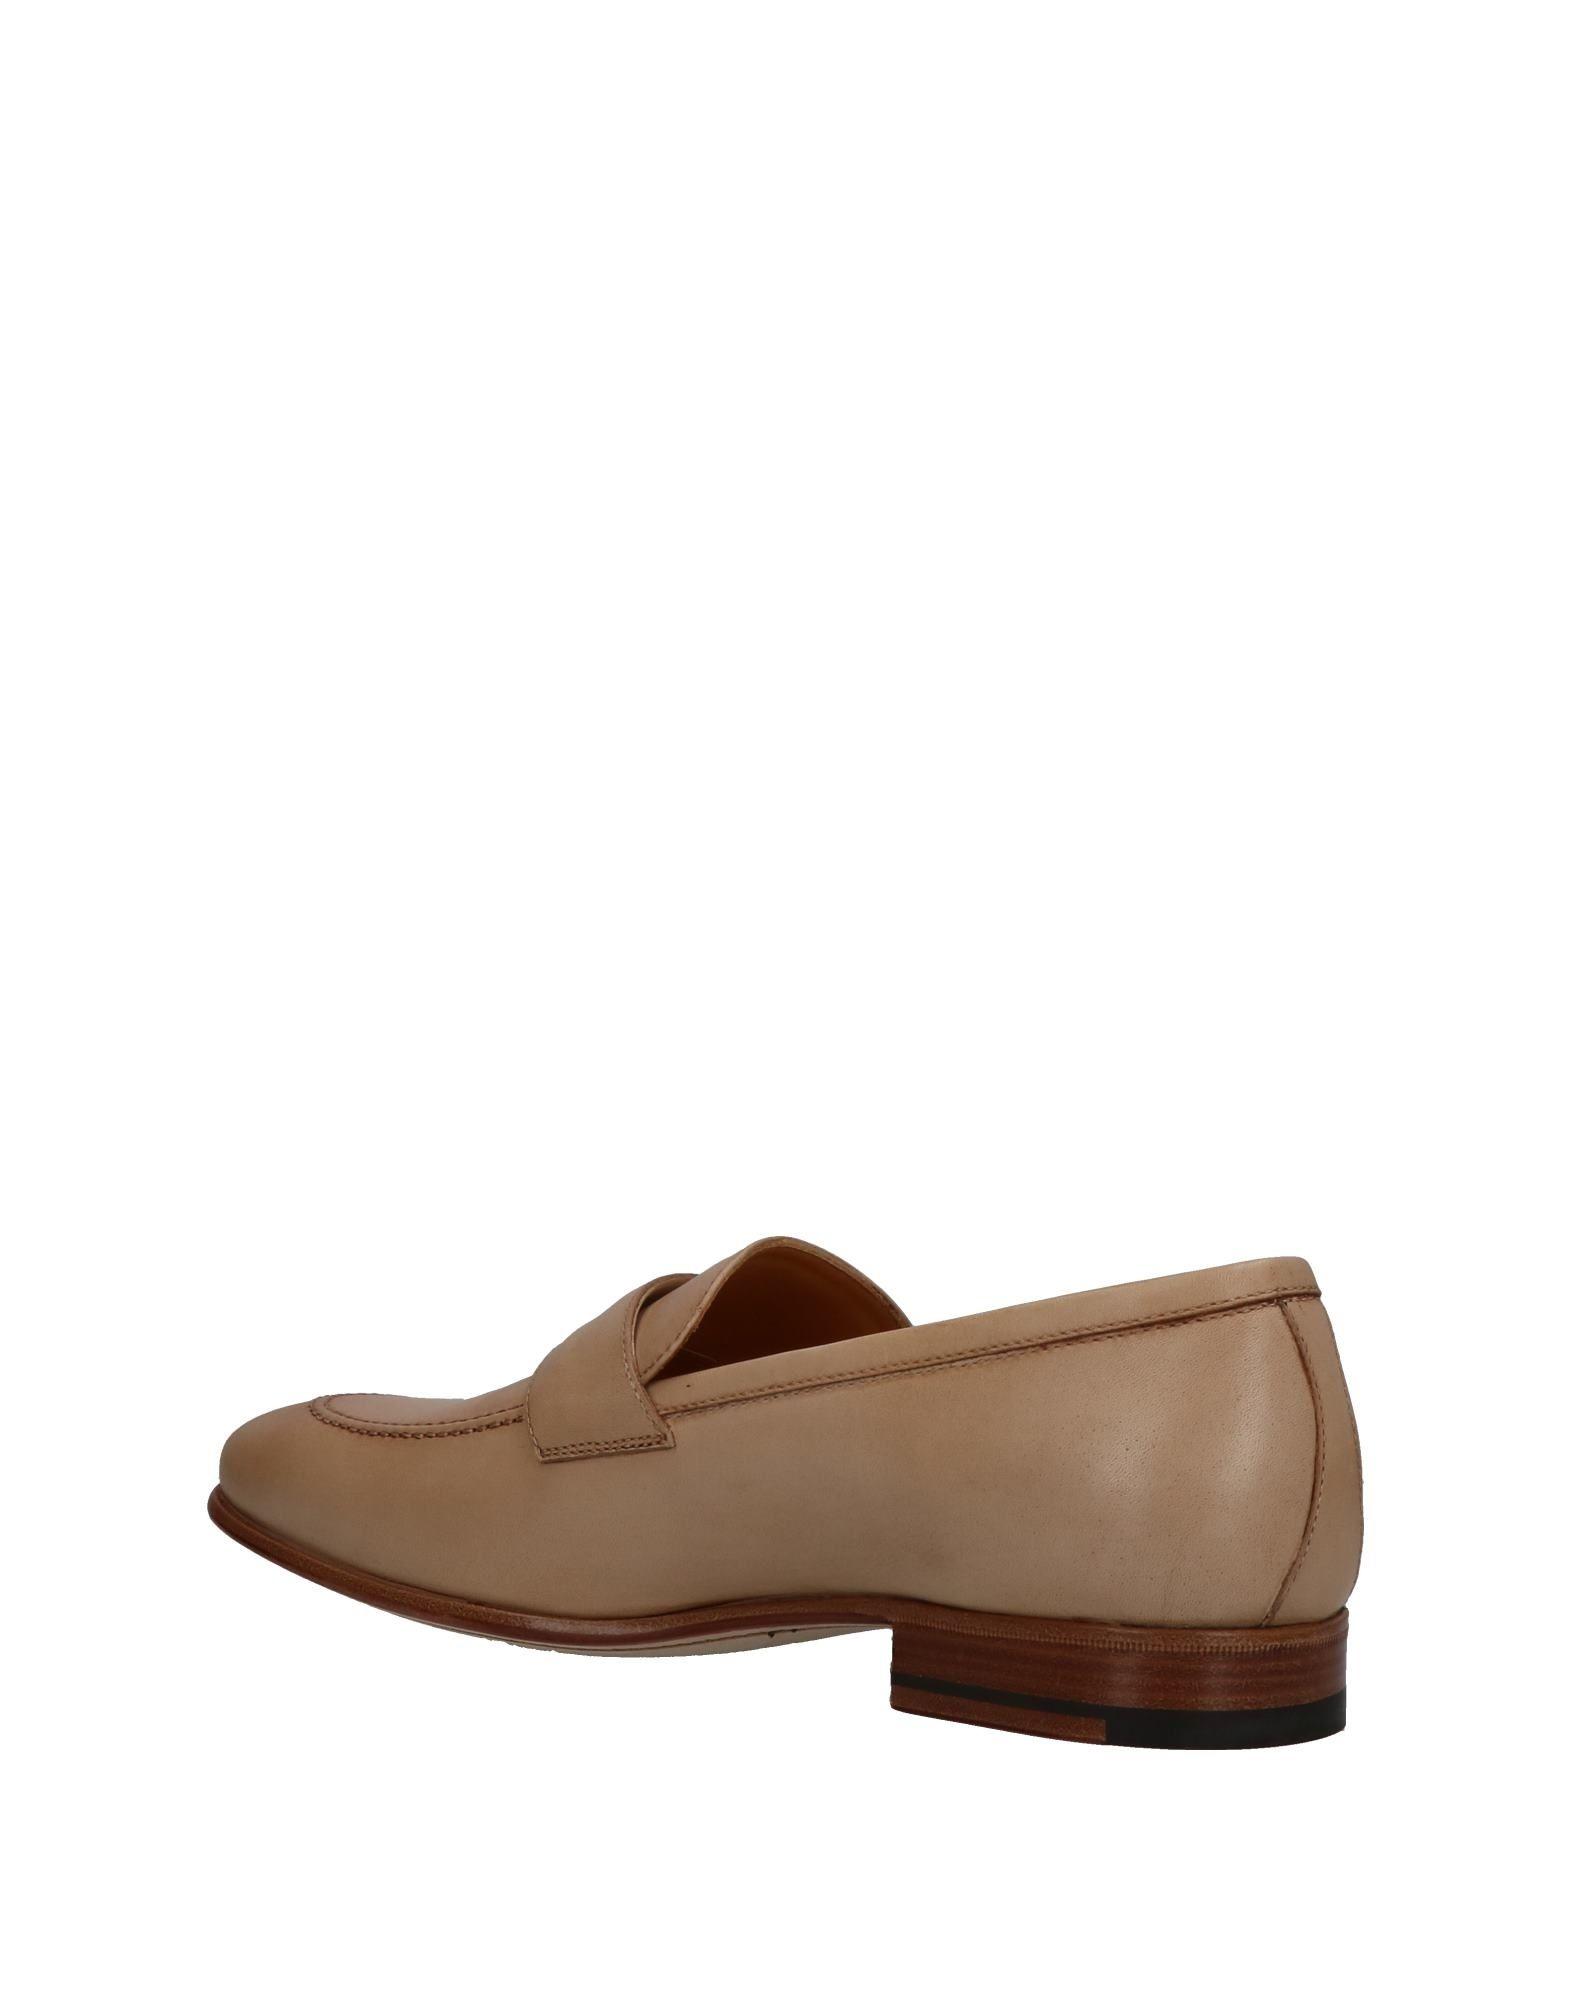 A.Testoni Mokassins Herren  11353256OR Gute Qualität beliebte Schuhe